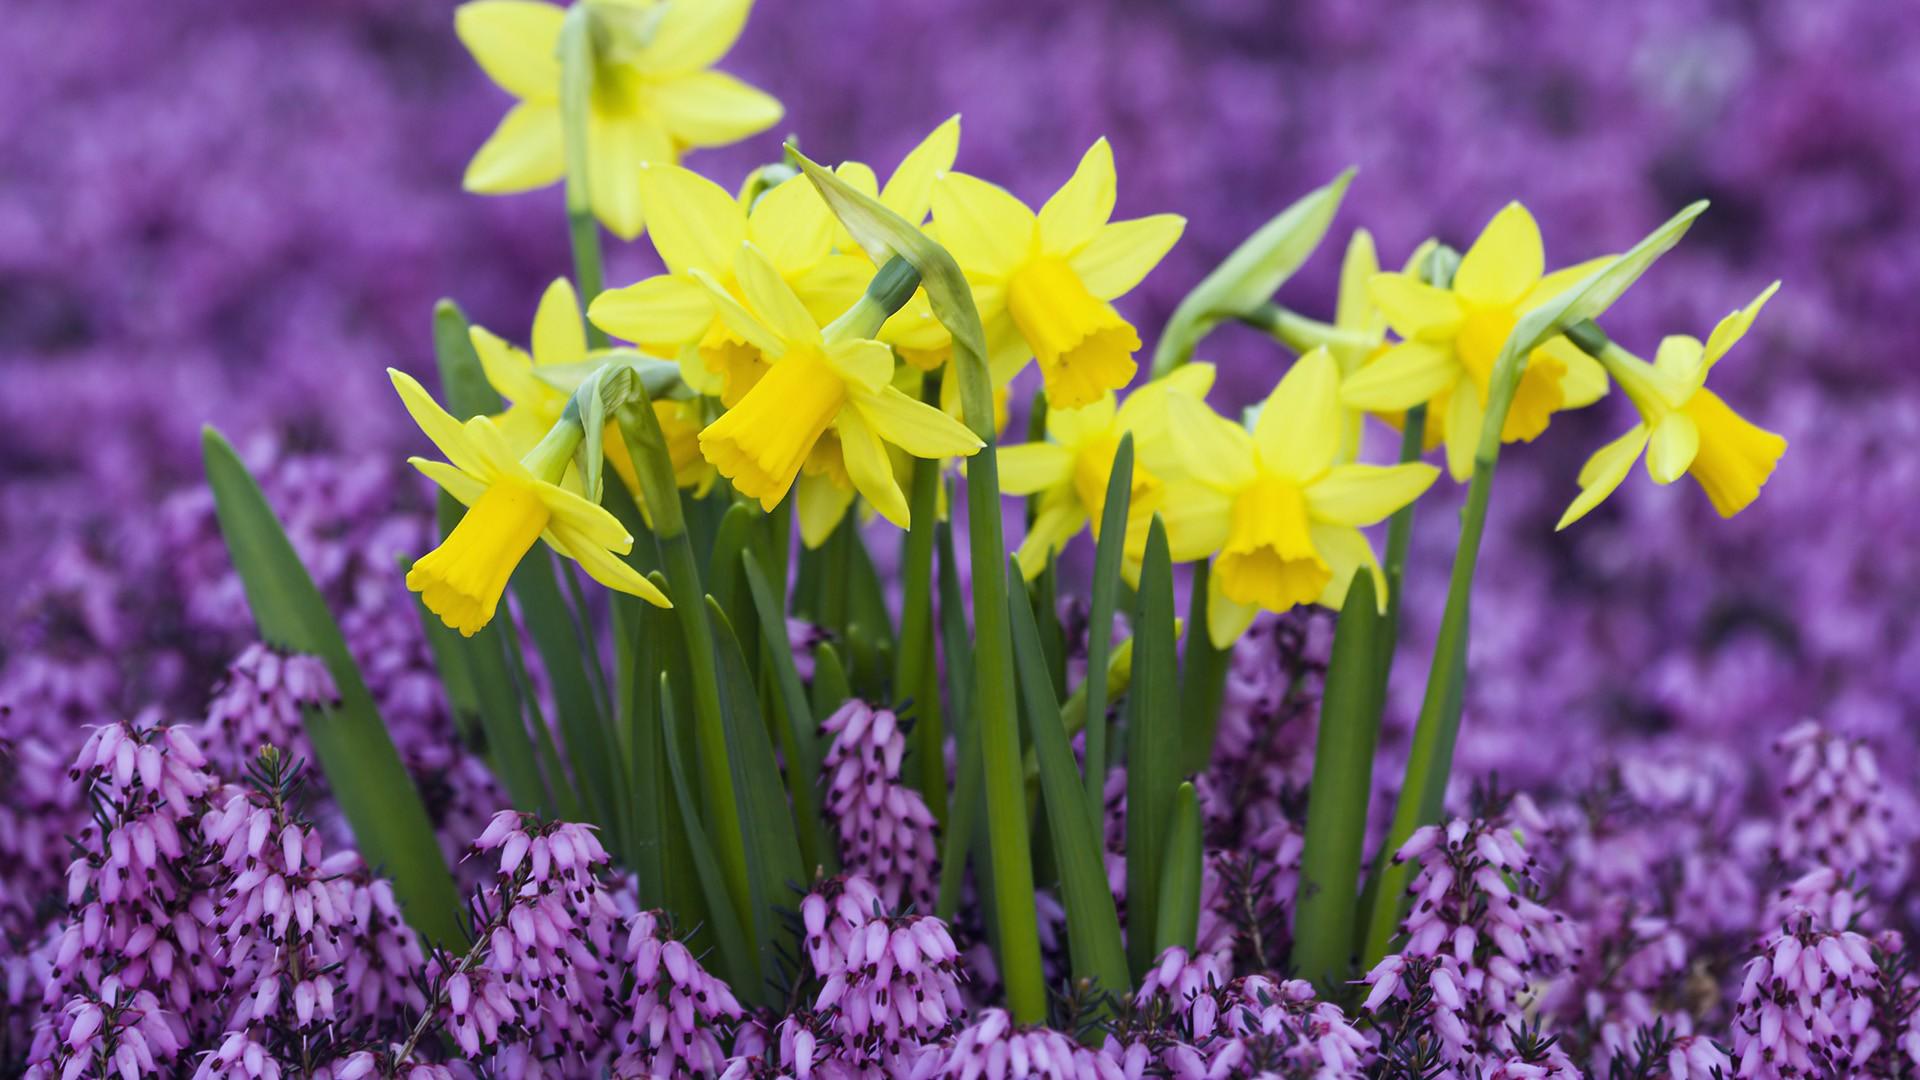 daffodils background 20835